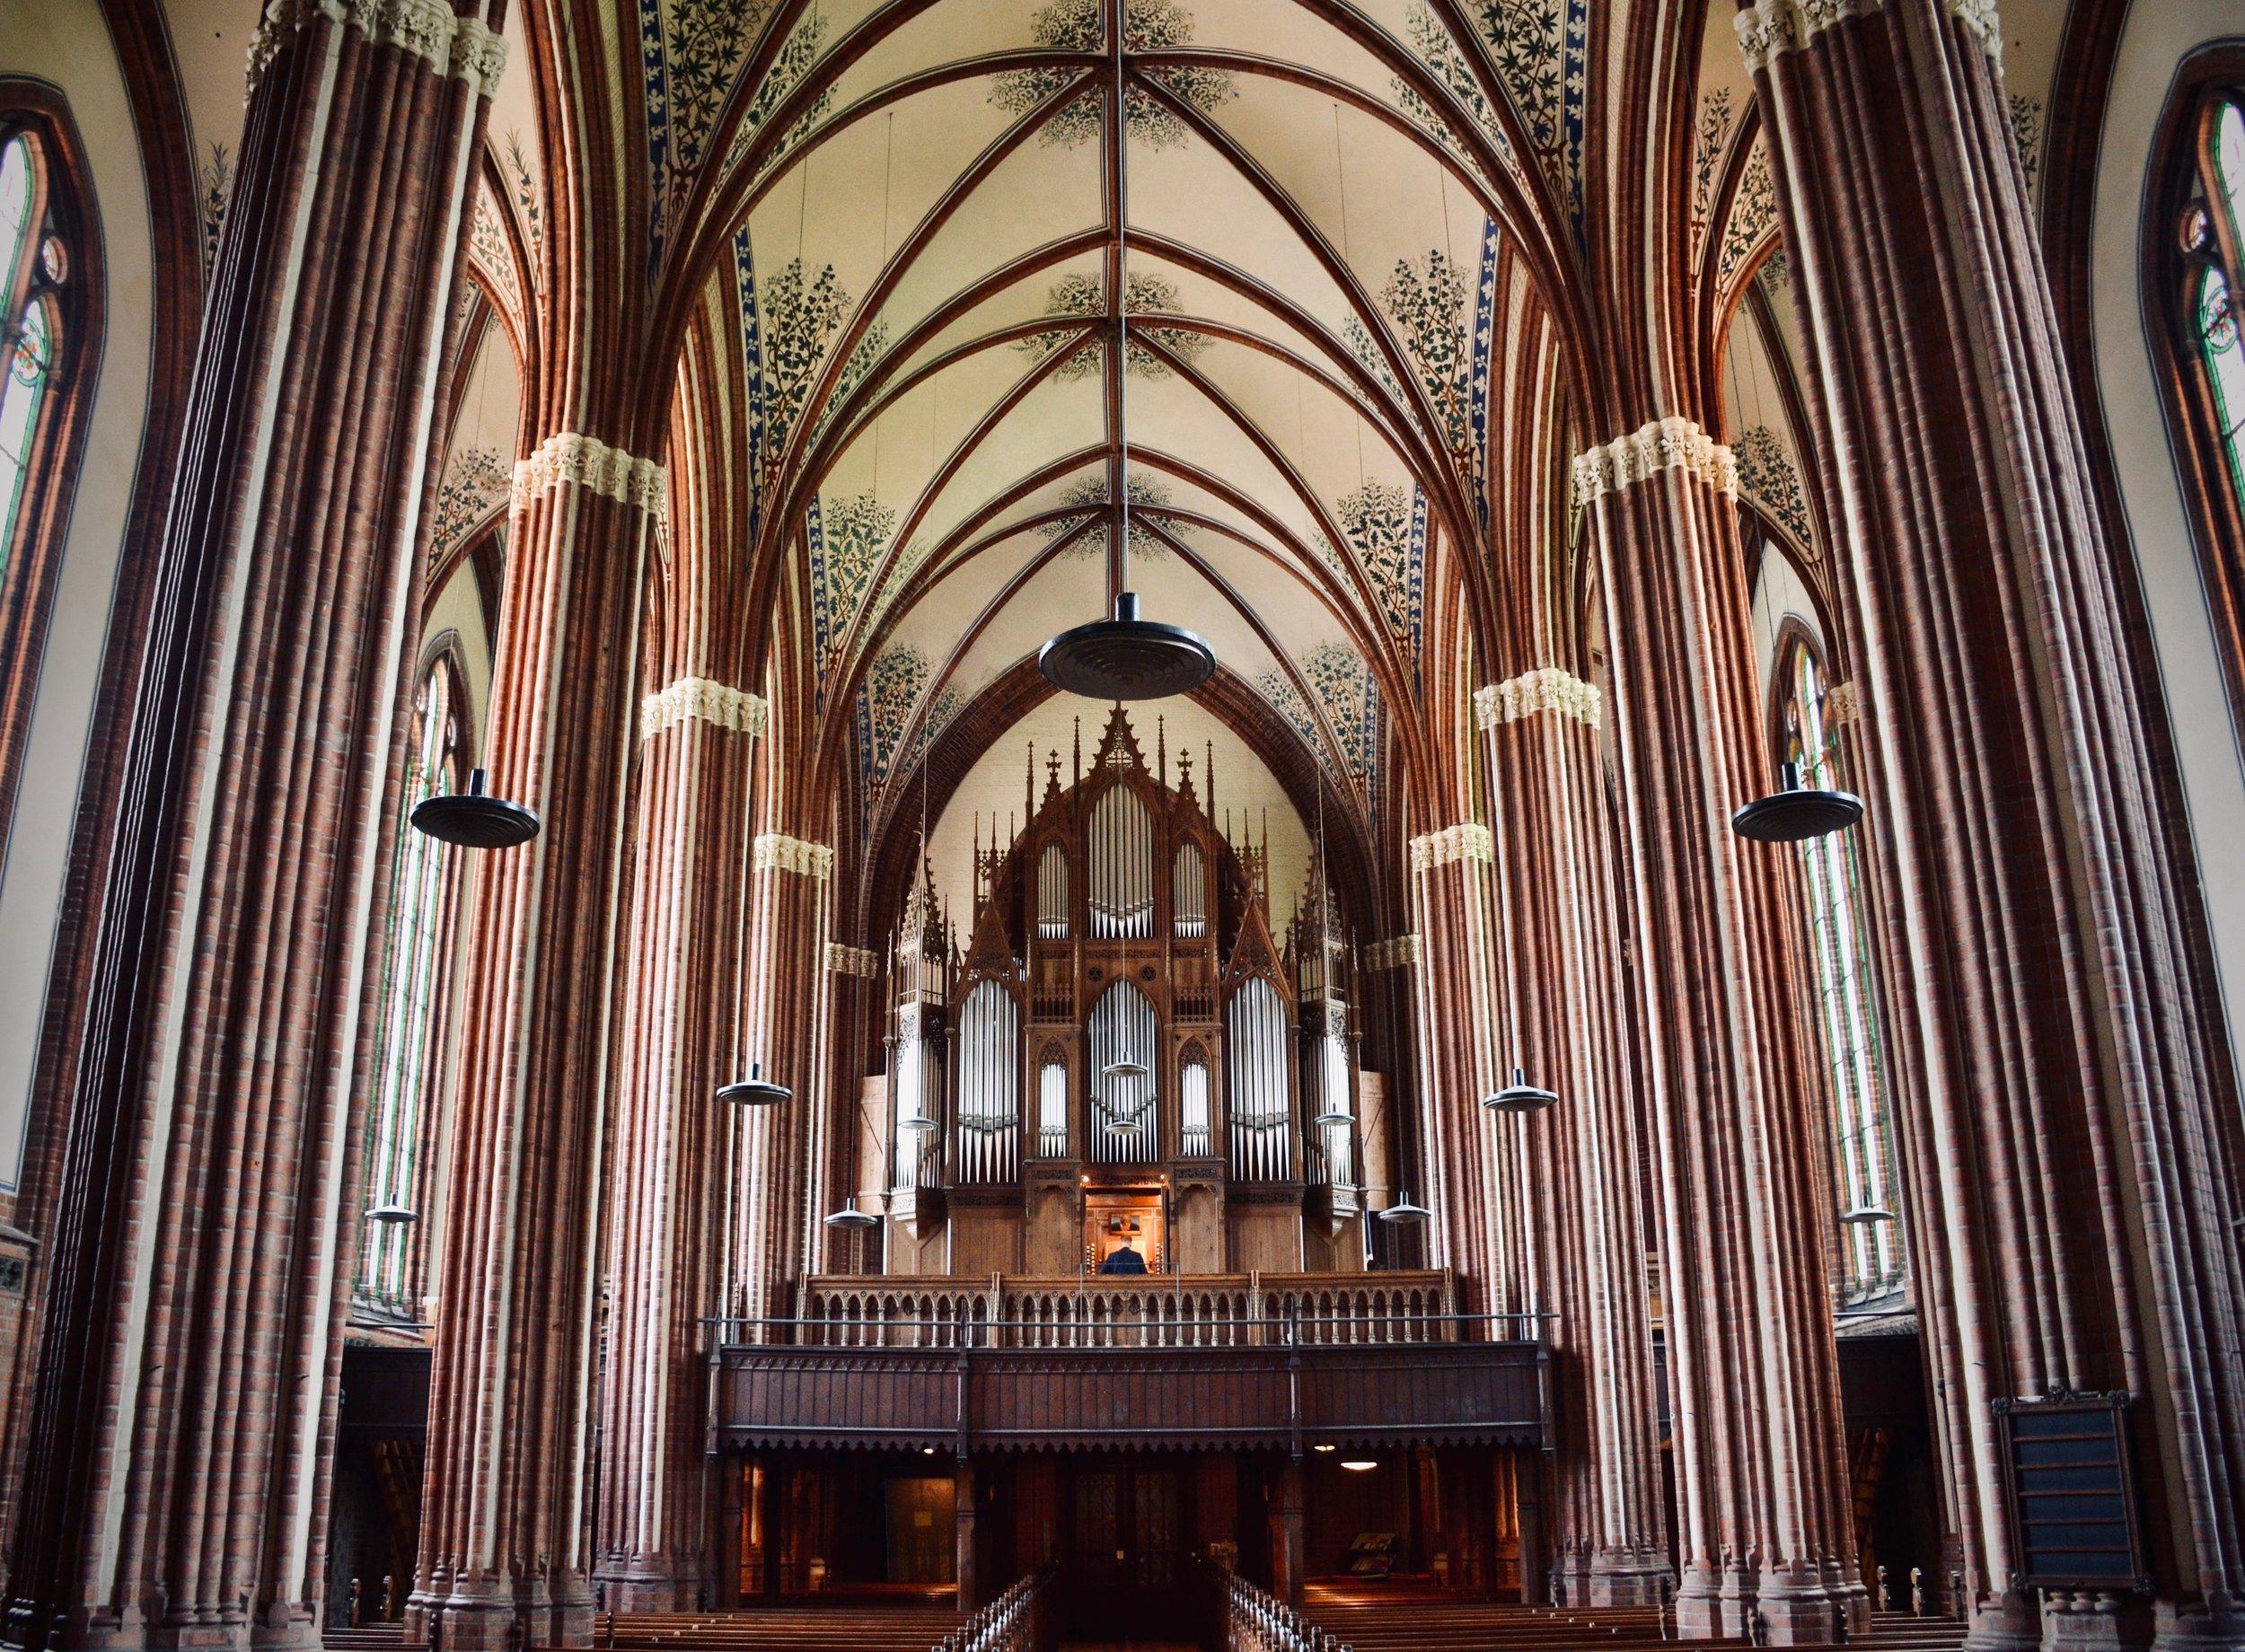 1869 Friese Organ, Paulskirche, Schwerin